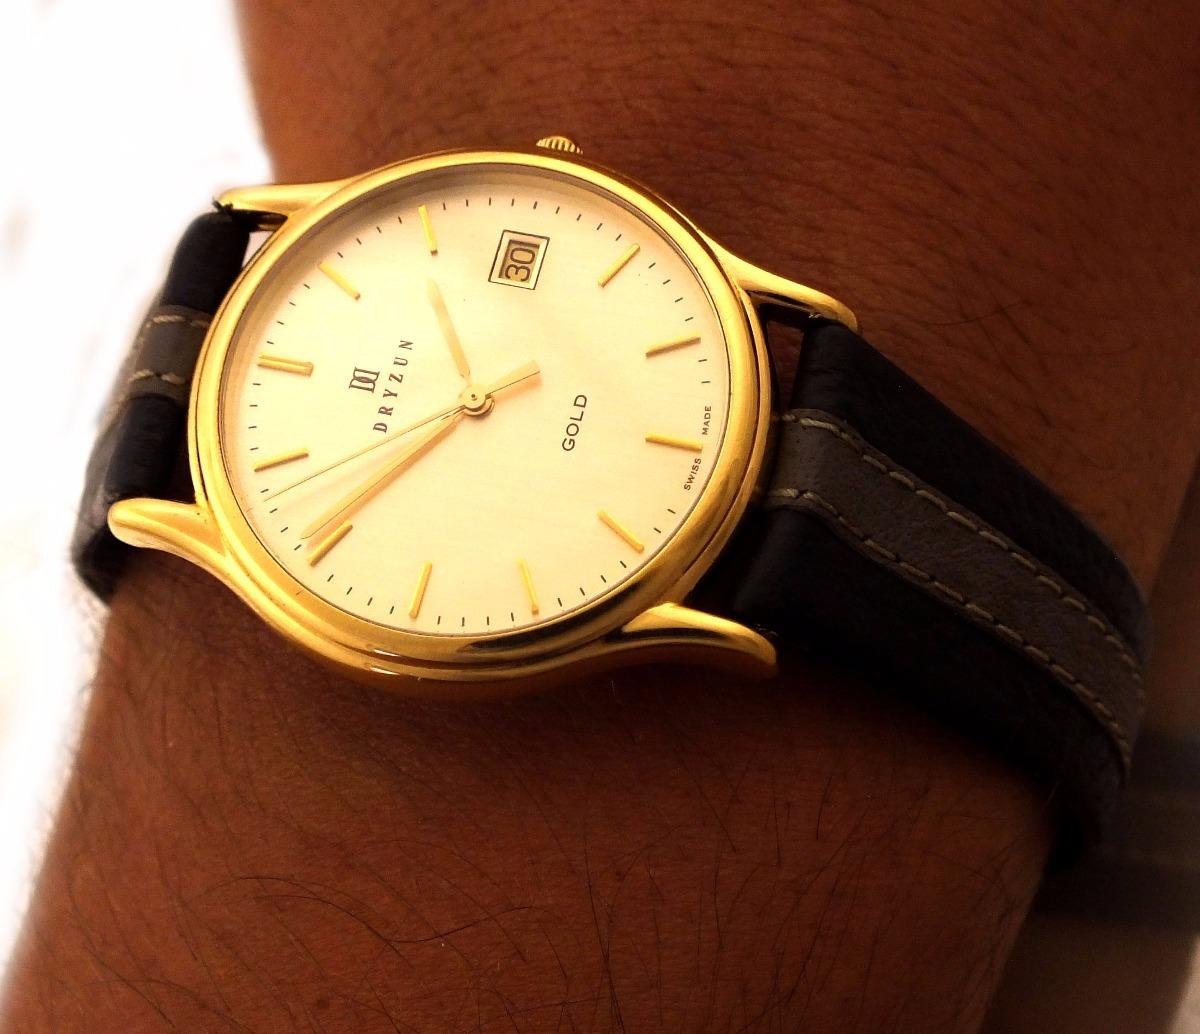 3bde20d5482 Relógio De Pulso Dryzun Masculino Em Ouro 18k J19999 - R  2.999